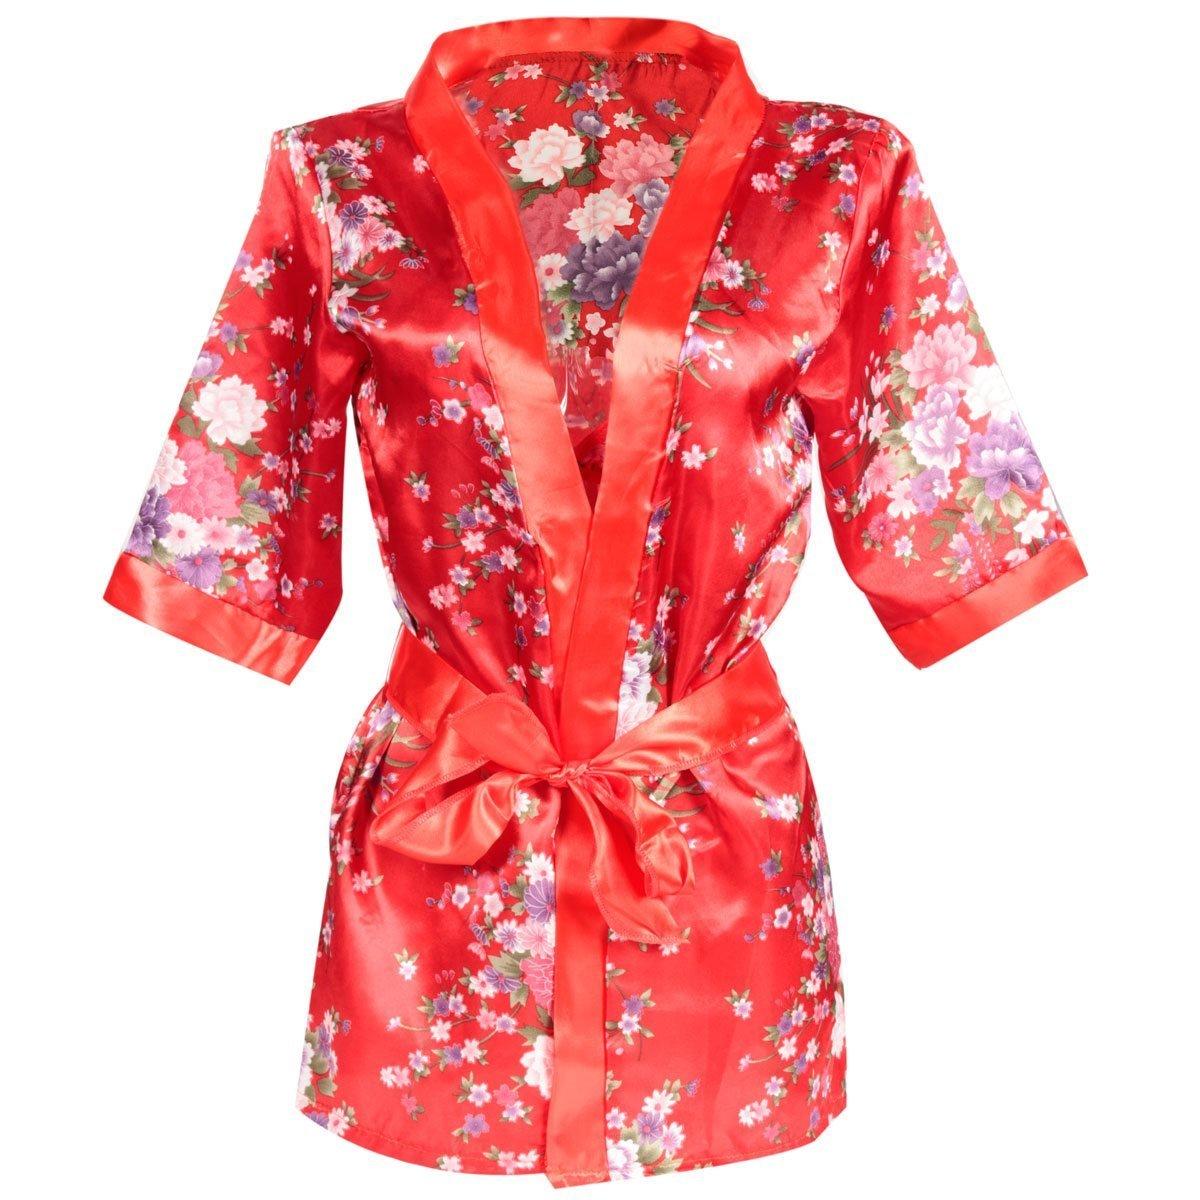 New 1 Set Hot Sexy Women G-string Lingerie Satin Lace Red Kimono Intimate Sleepwear Robe Sexy Night Gown women Sexy Underwear